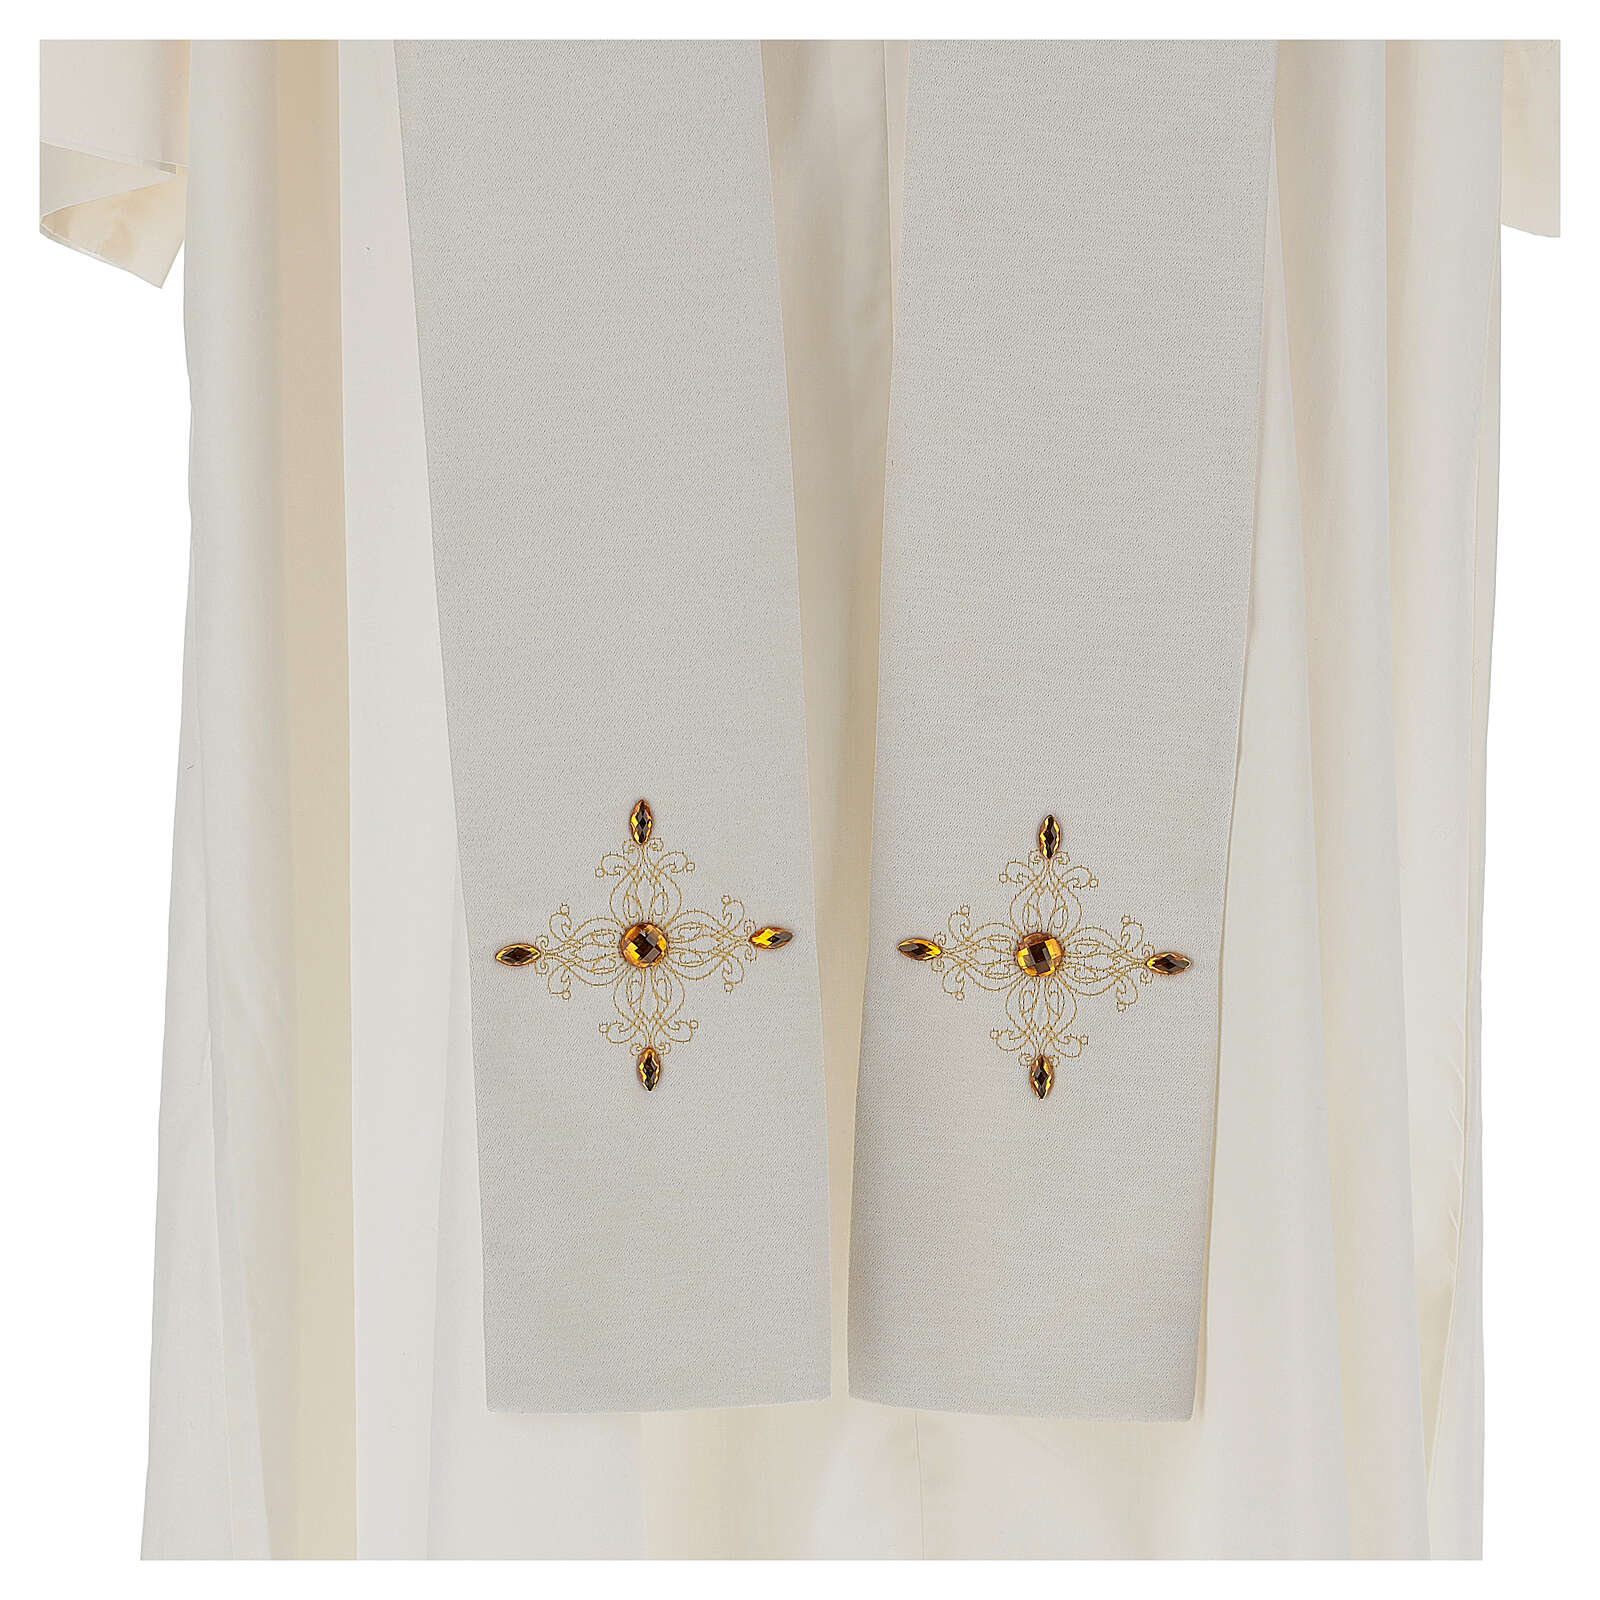 Chasuble 100% polyester décorations broderie applications or écru Édition Limitée 4